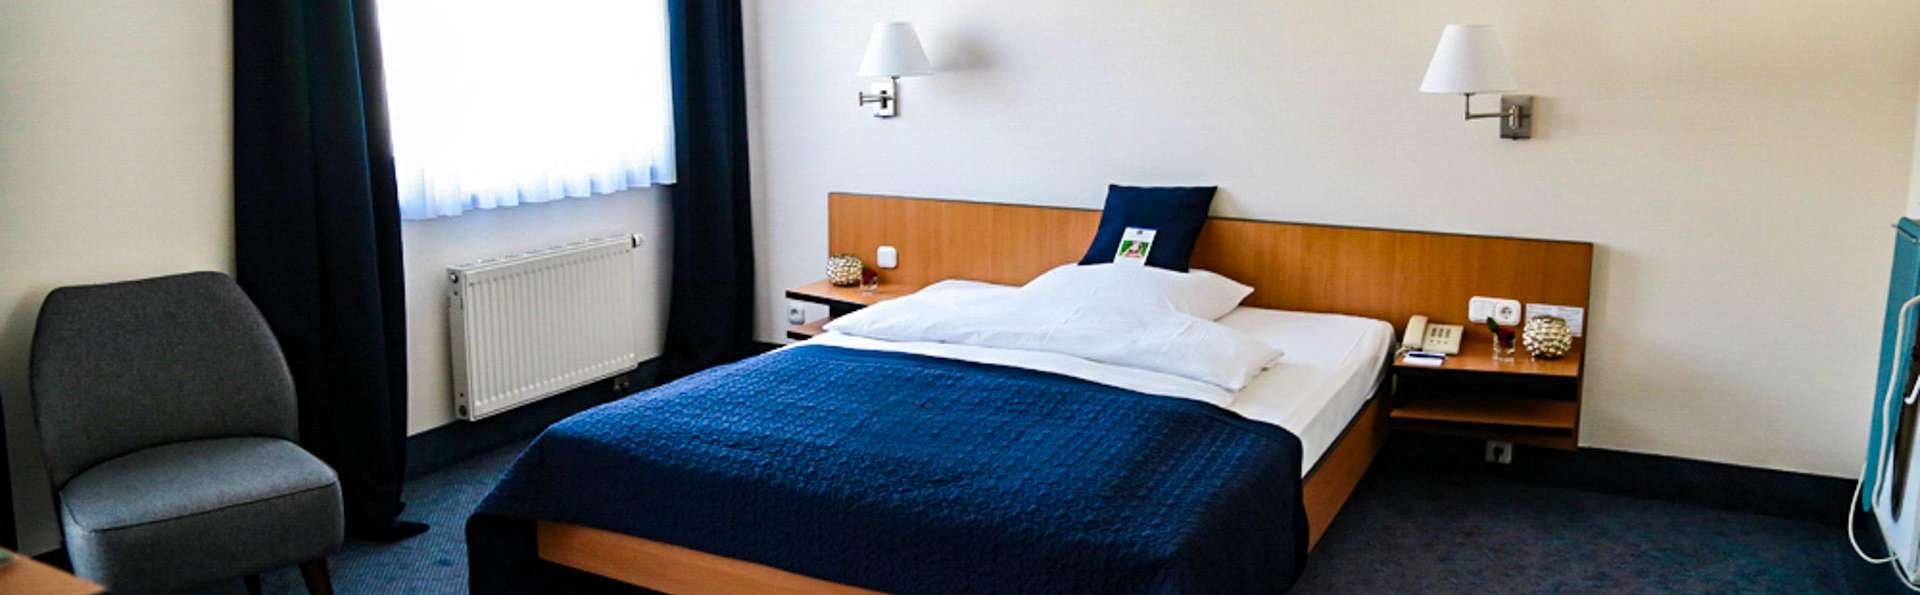 Best Western Hotel de Ville Eschweiler - EDIT_ROOM_01.jpg